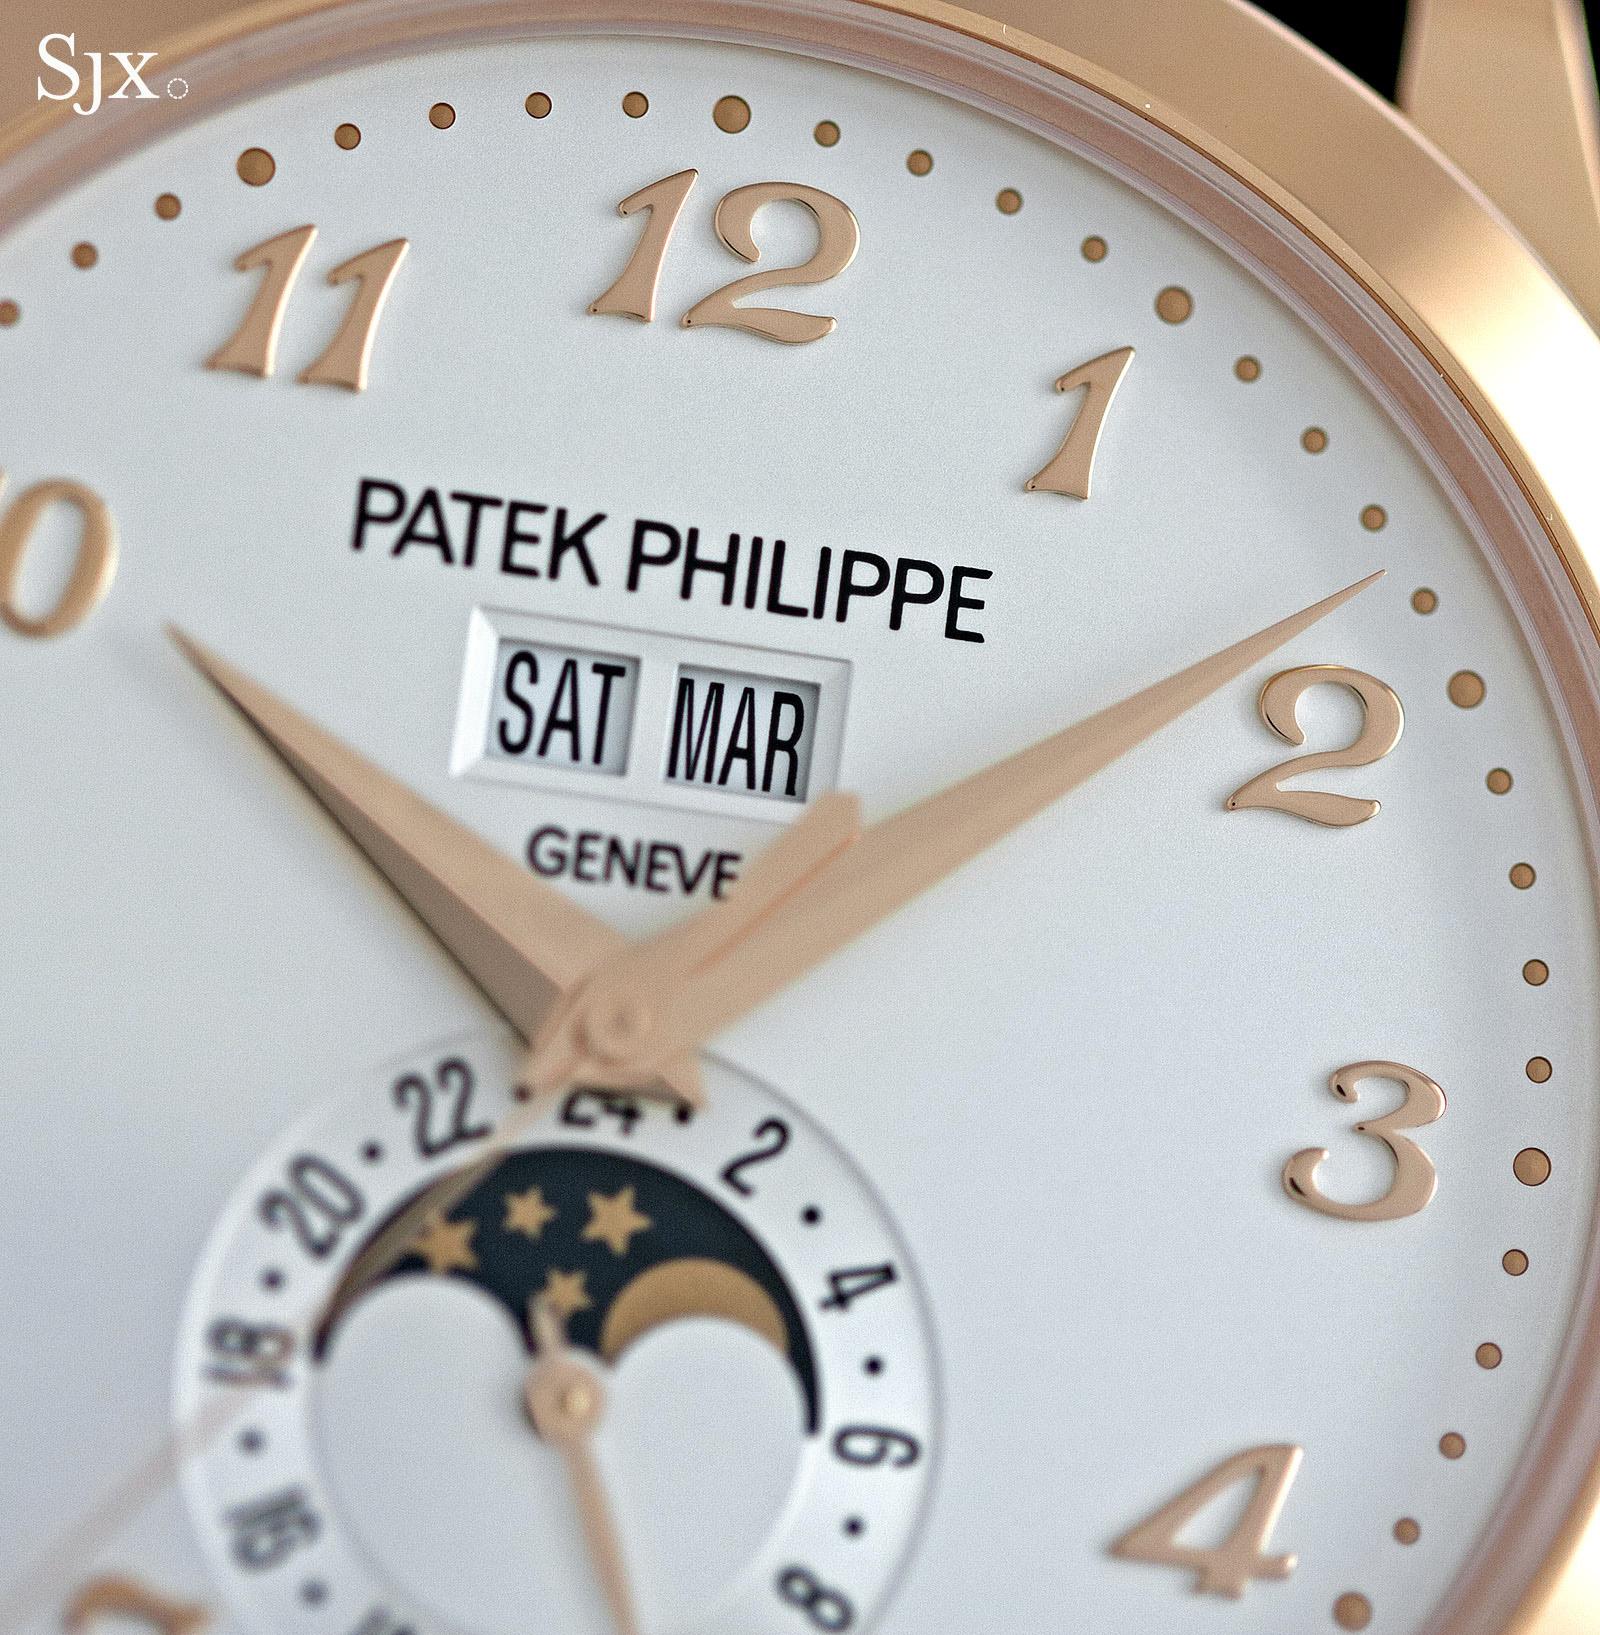 Patek Philippe annual calendar ref. 5396G-012.1